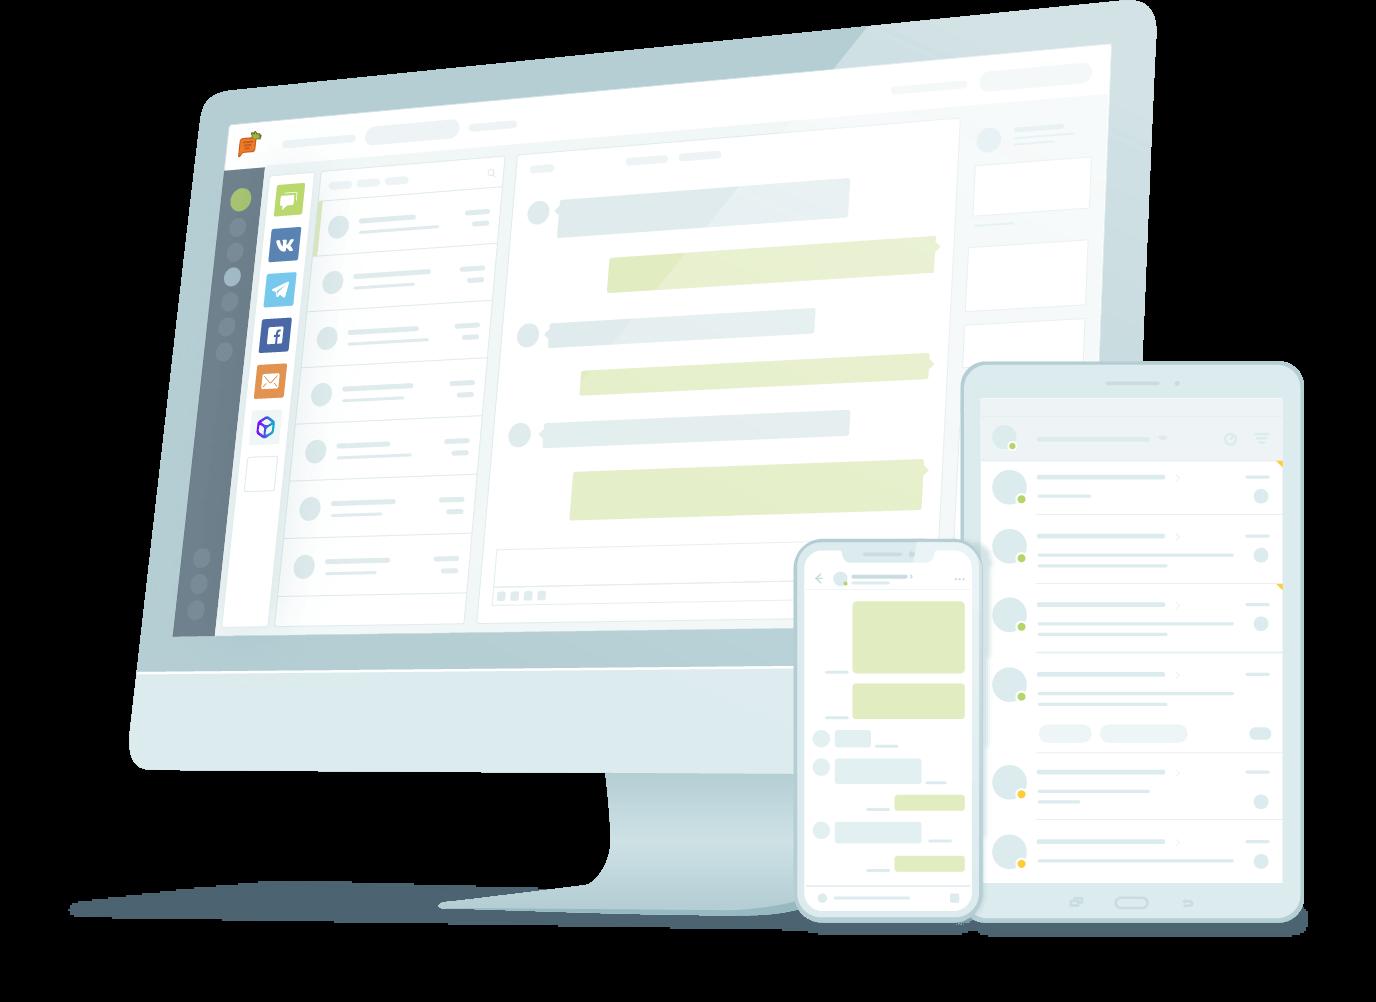 связь с клиентом через онлайн-консультант